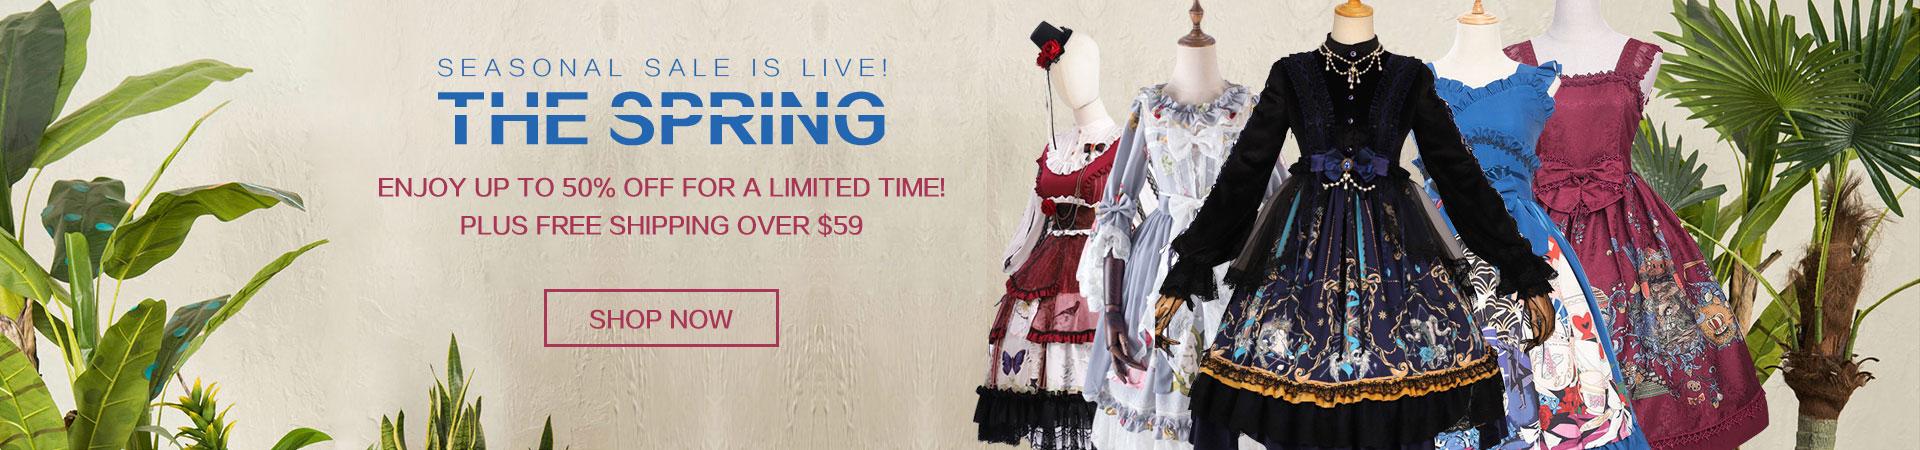 Seasonal Sale Is Live